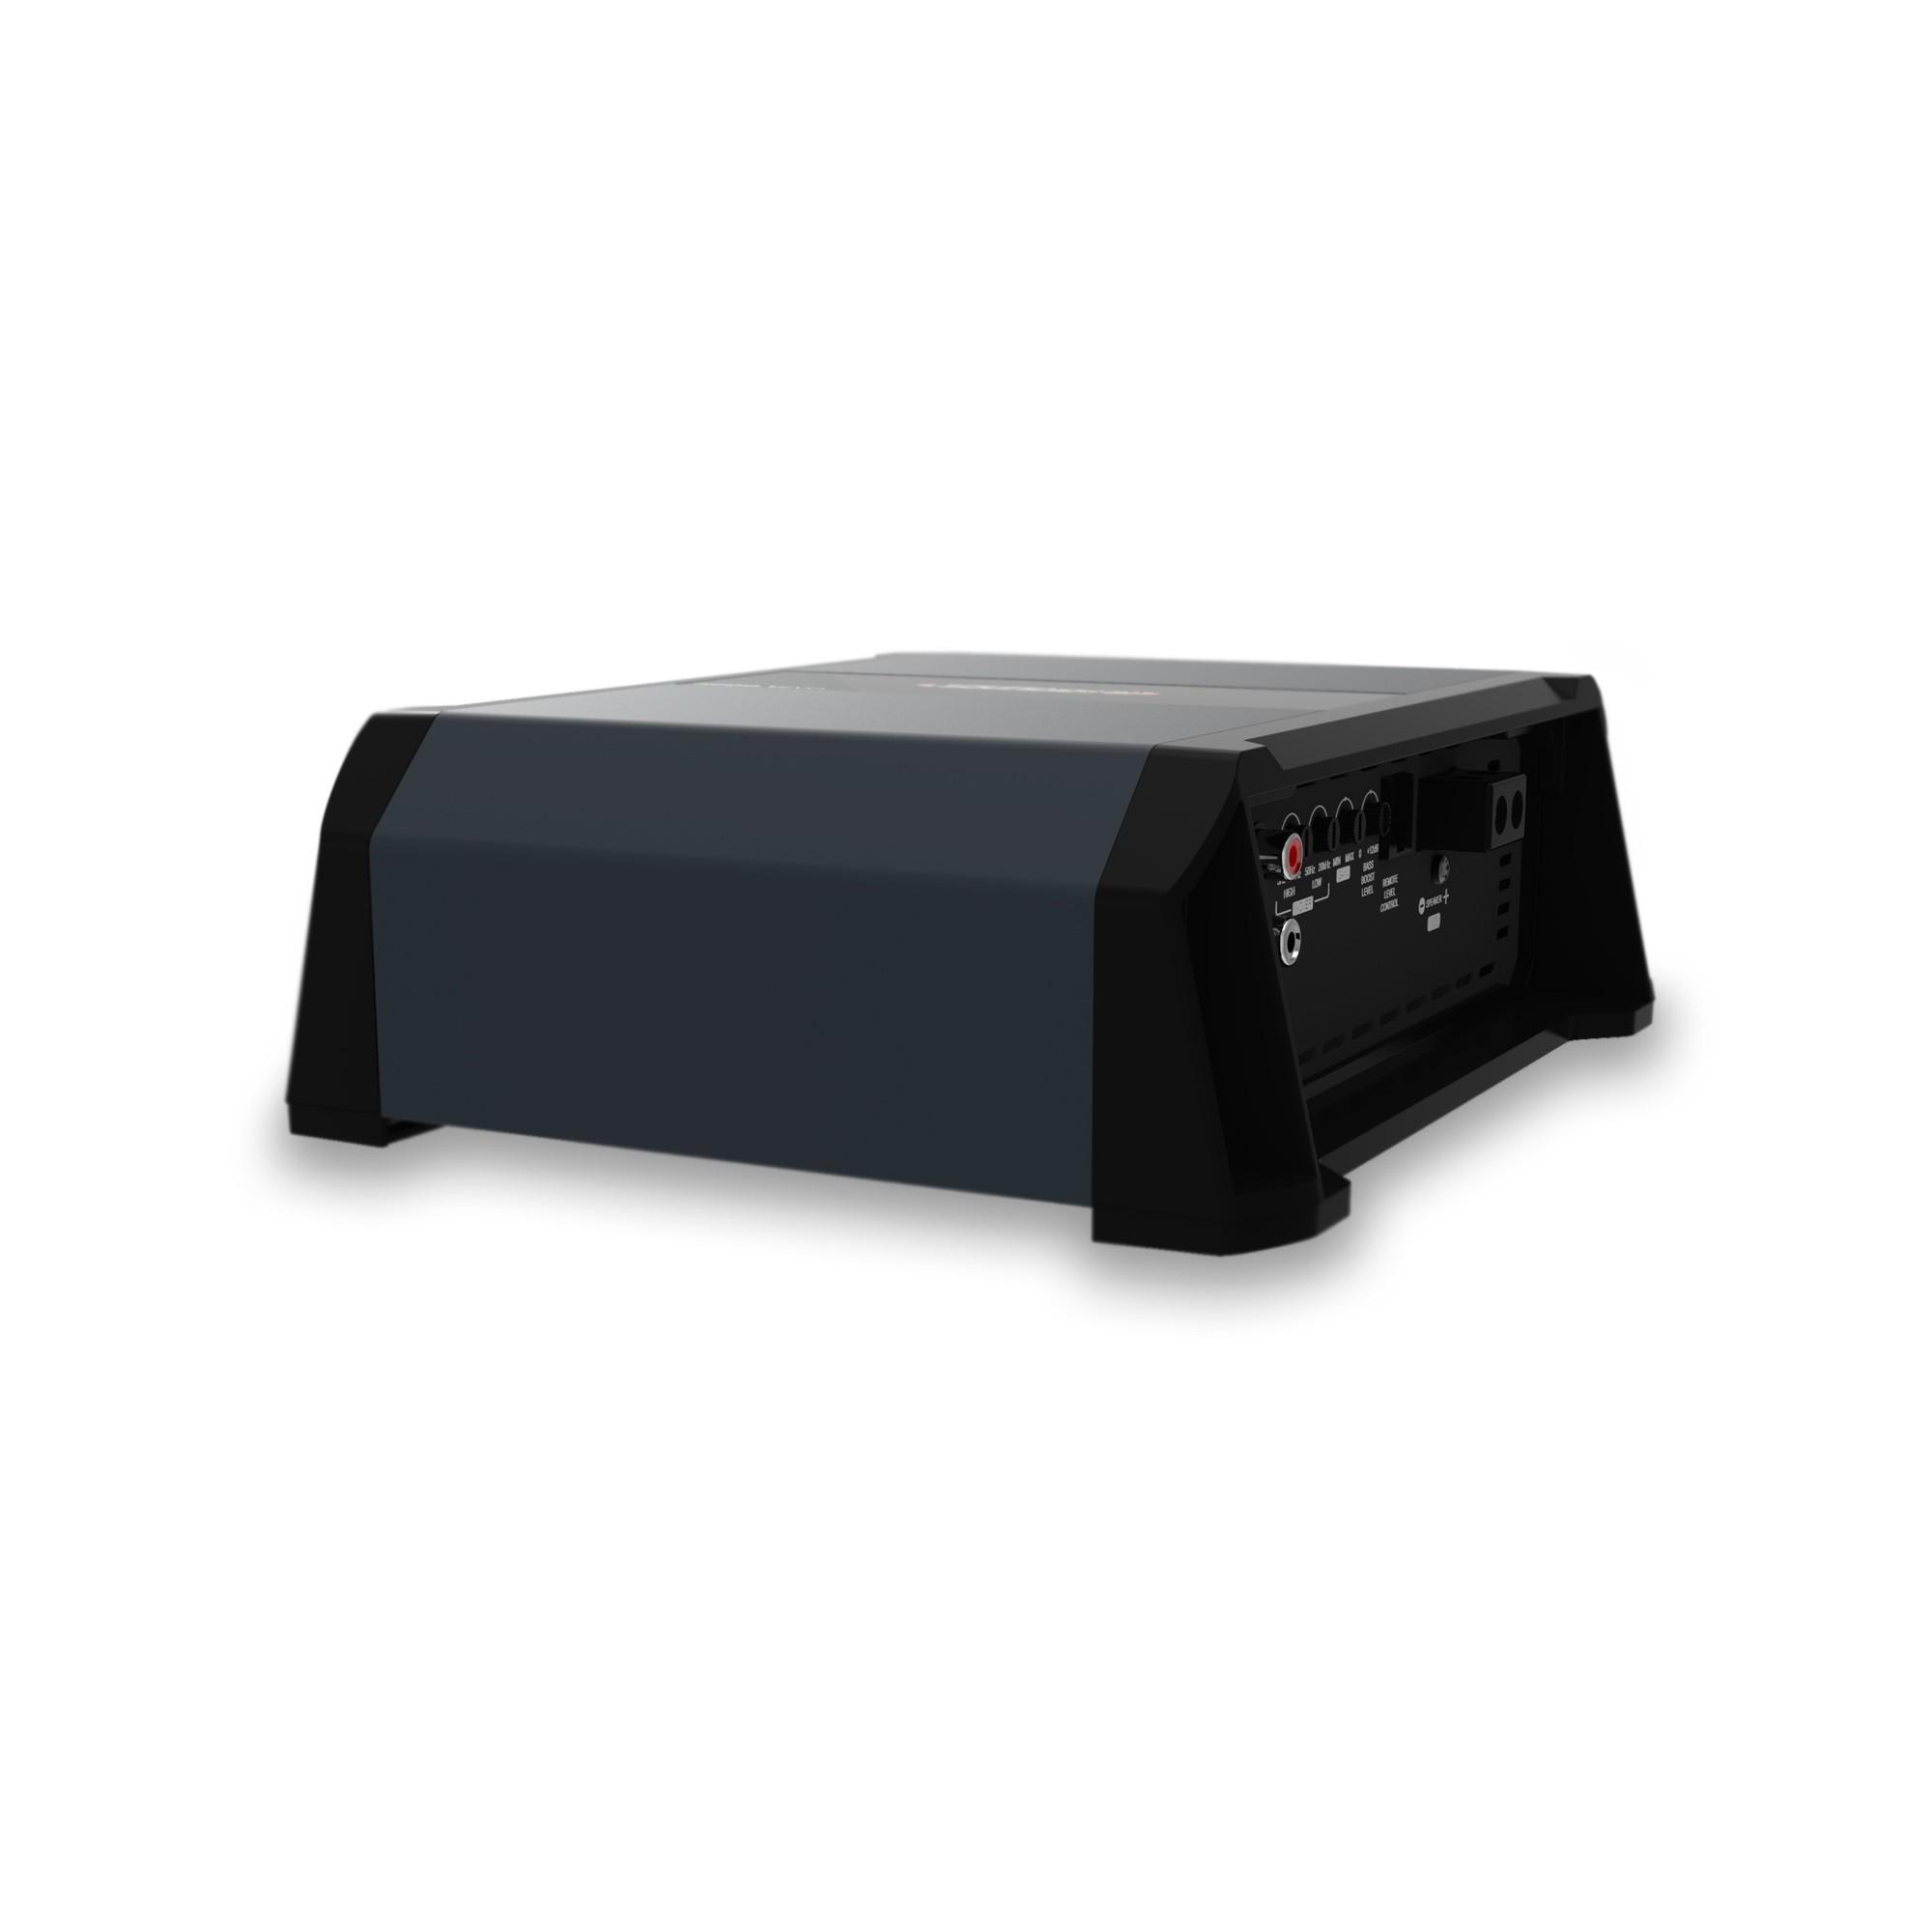 Módulo Amplificador Soundigital SD 3000.1 EVO 4.0 3000W Rms 2 Ohms 1 Canal